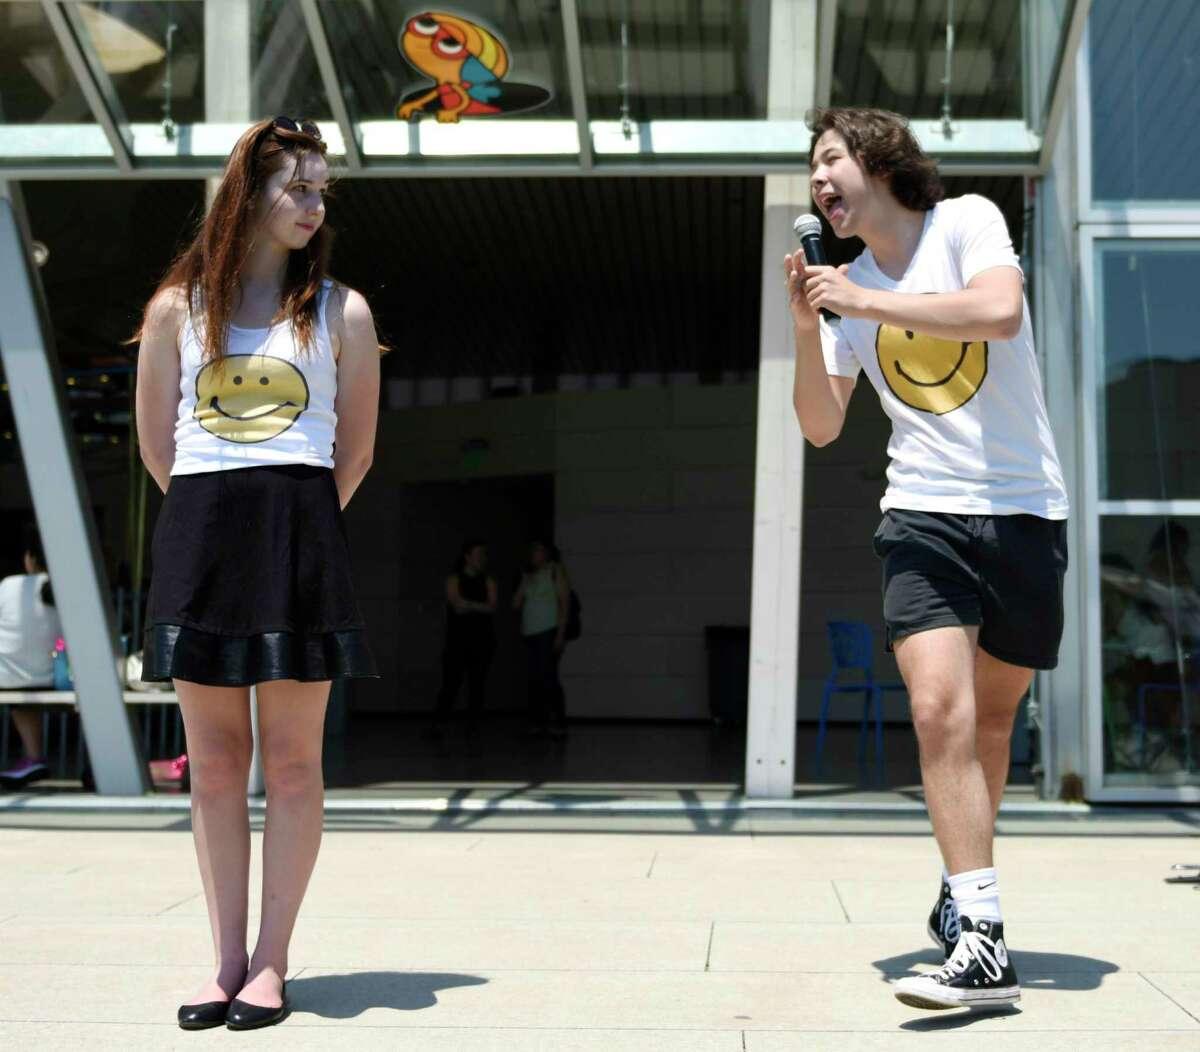 Stamford High School junior Alex Rubin, right, sings